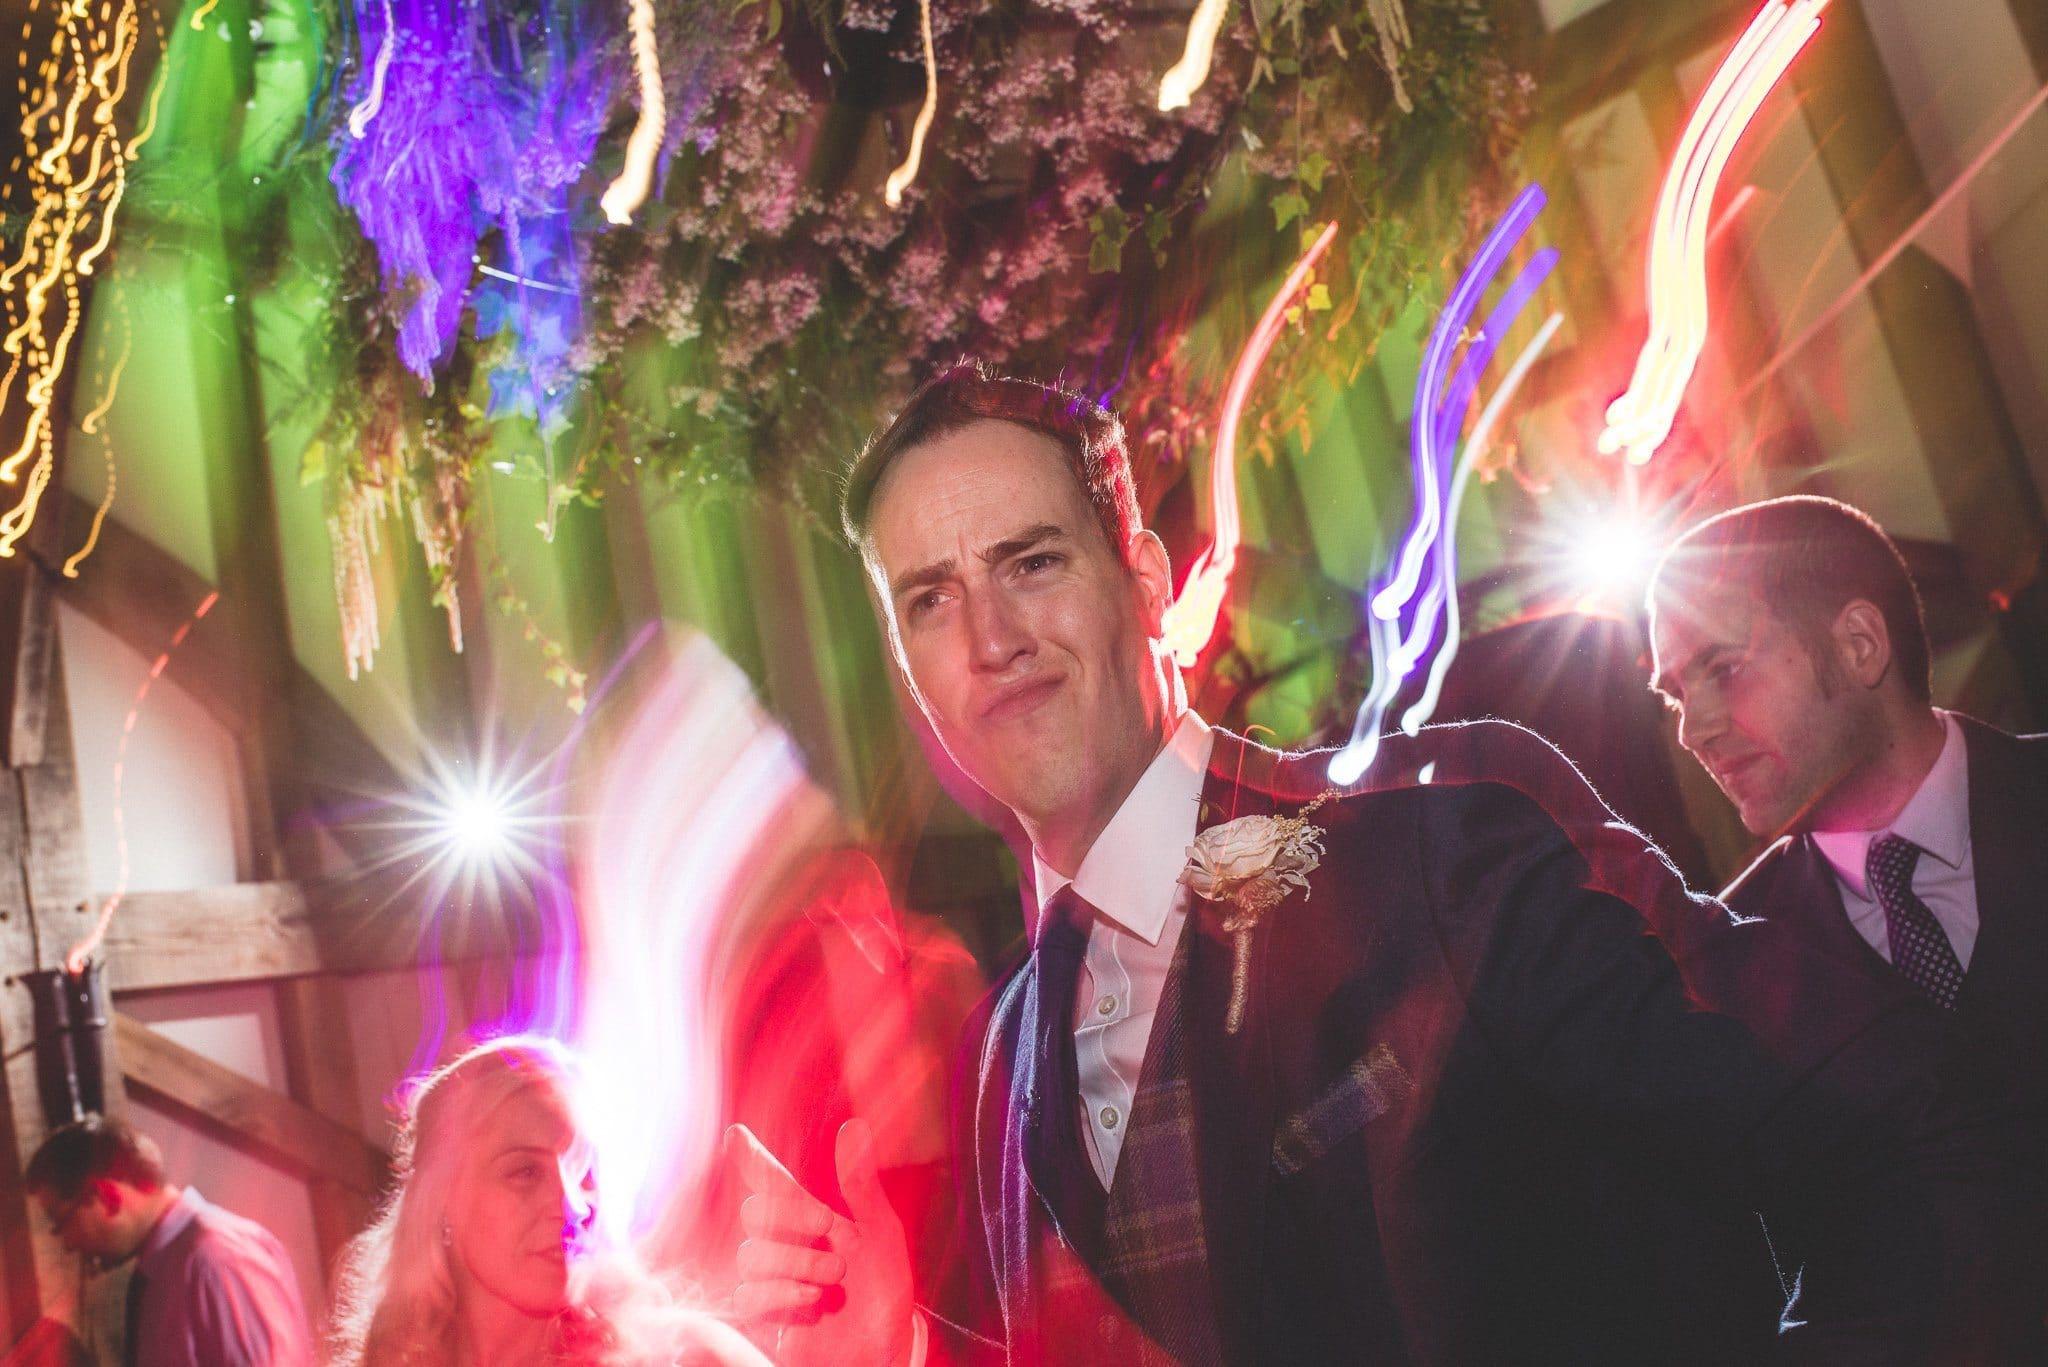 Philip rocks out on the dancefloor